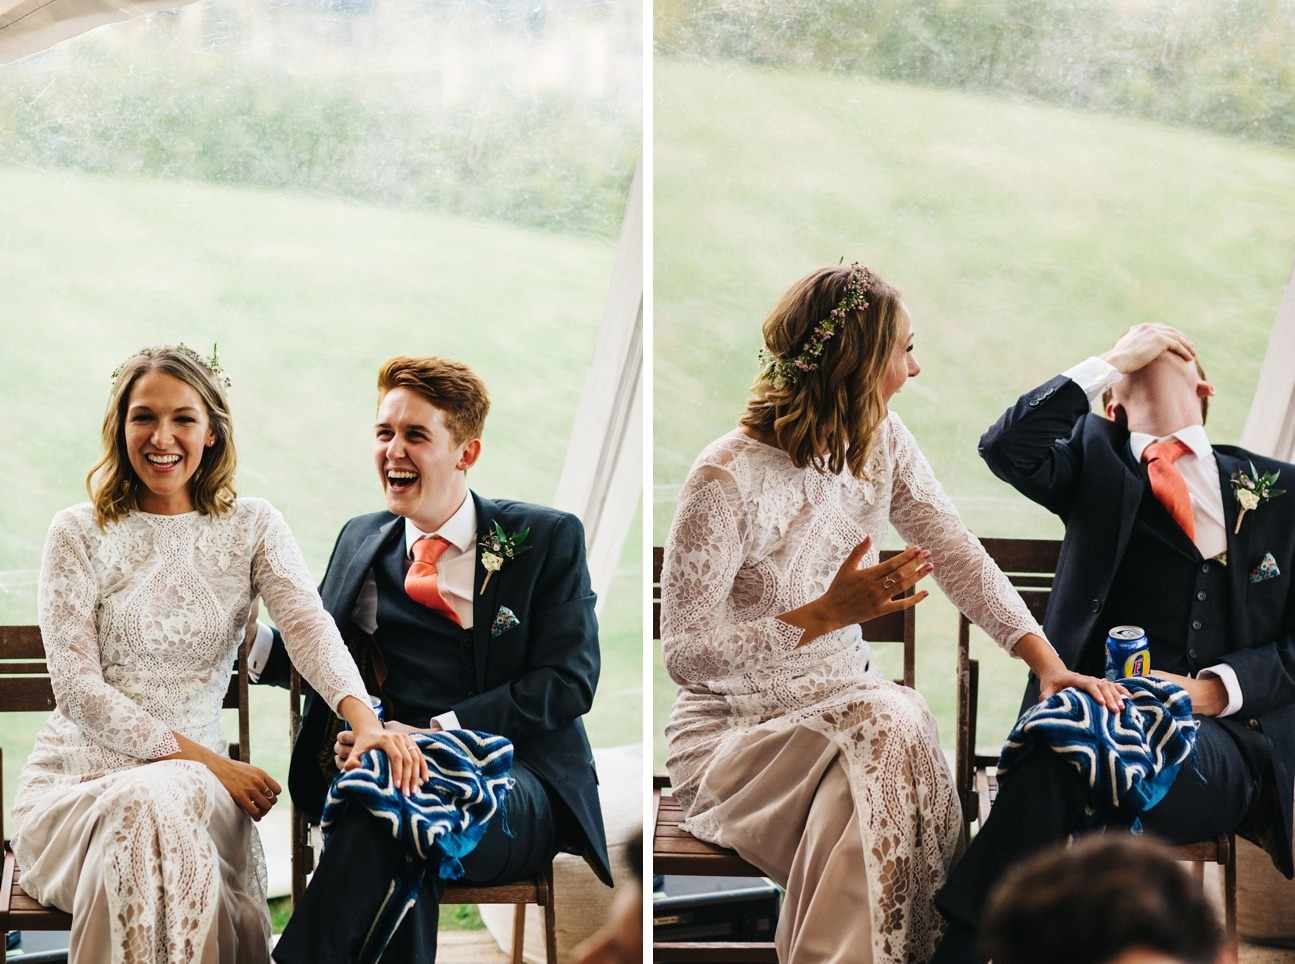 Hampshire Barn wedding in ibthorpe 093